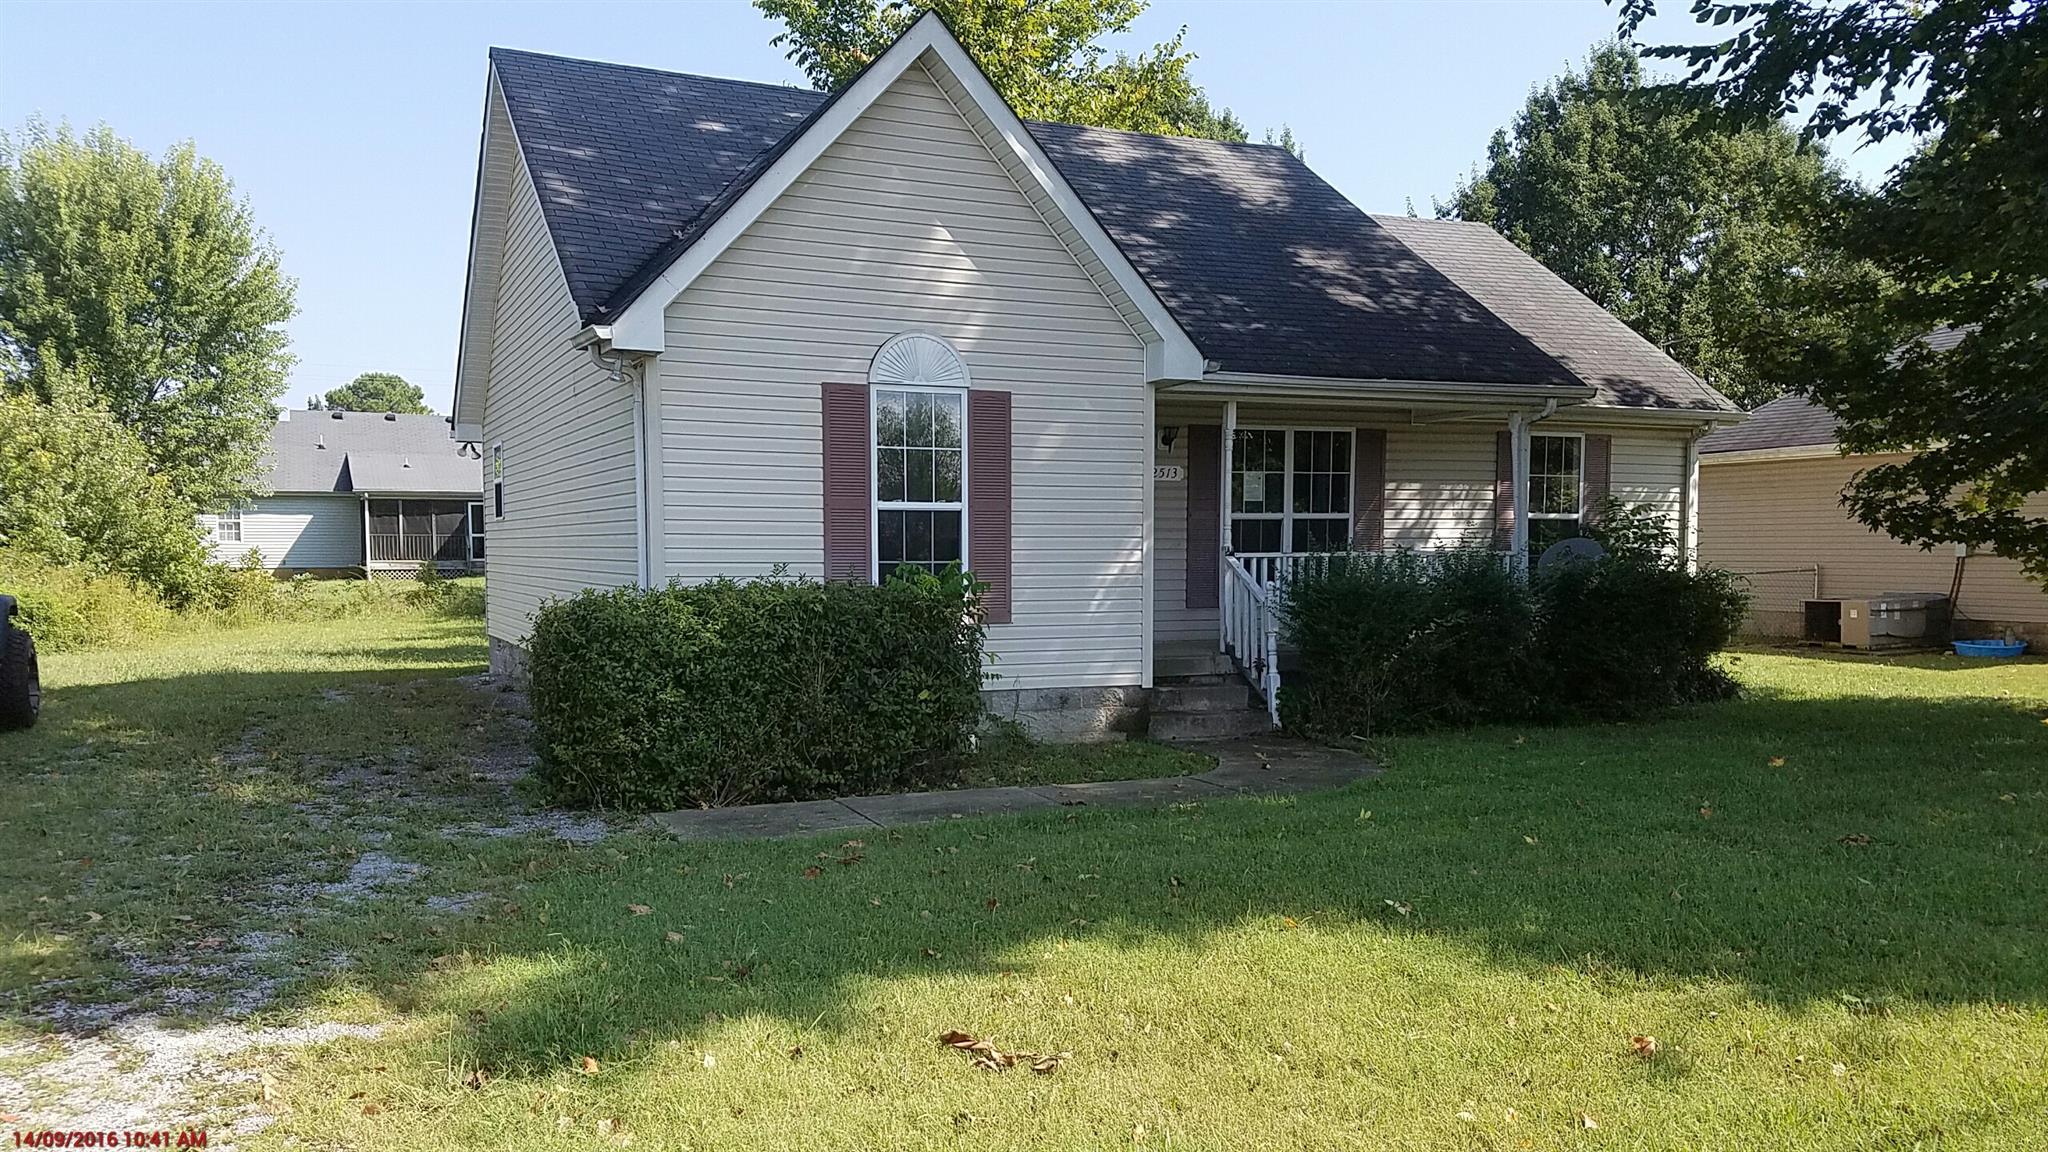 Photo of 2513 Hillingdon Dr  Murfreesboro  TN